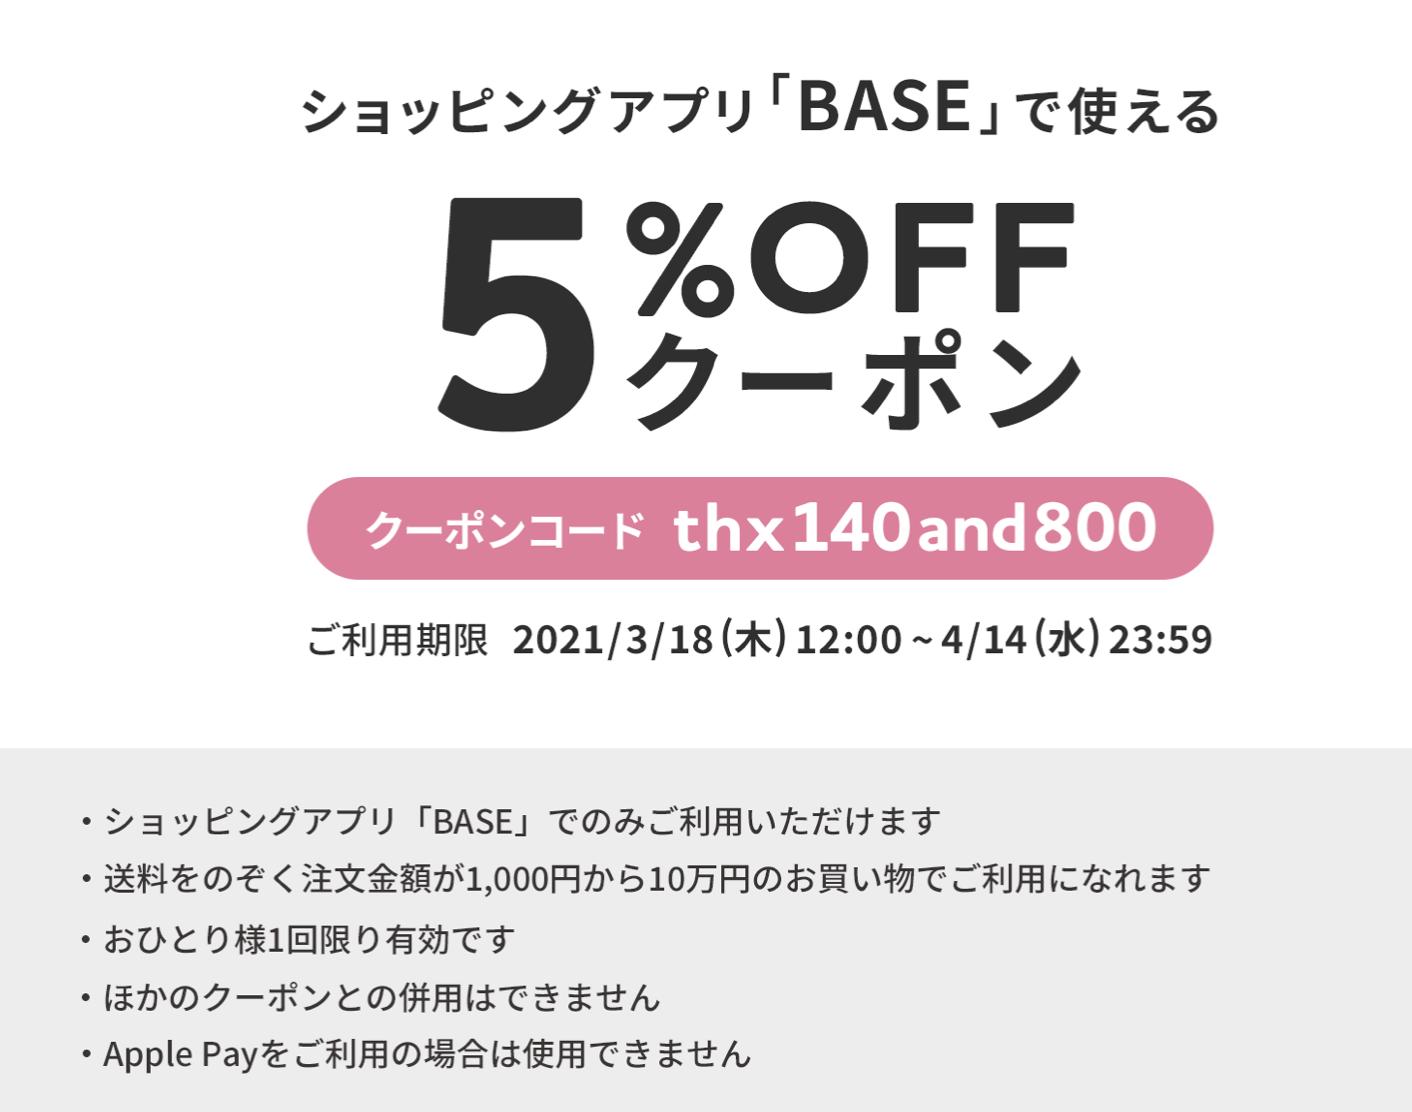 5%OFFクーポン発行中ですよ〜!